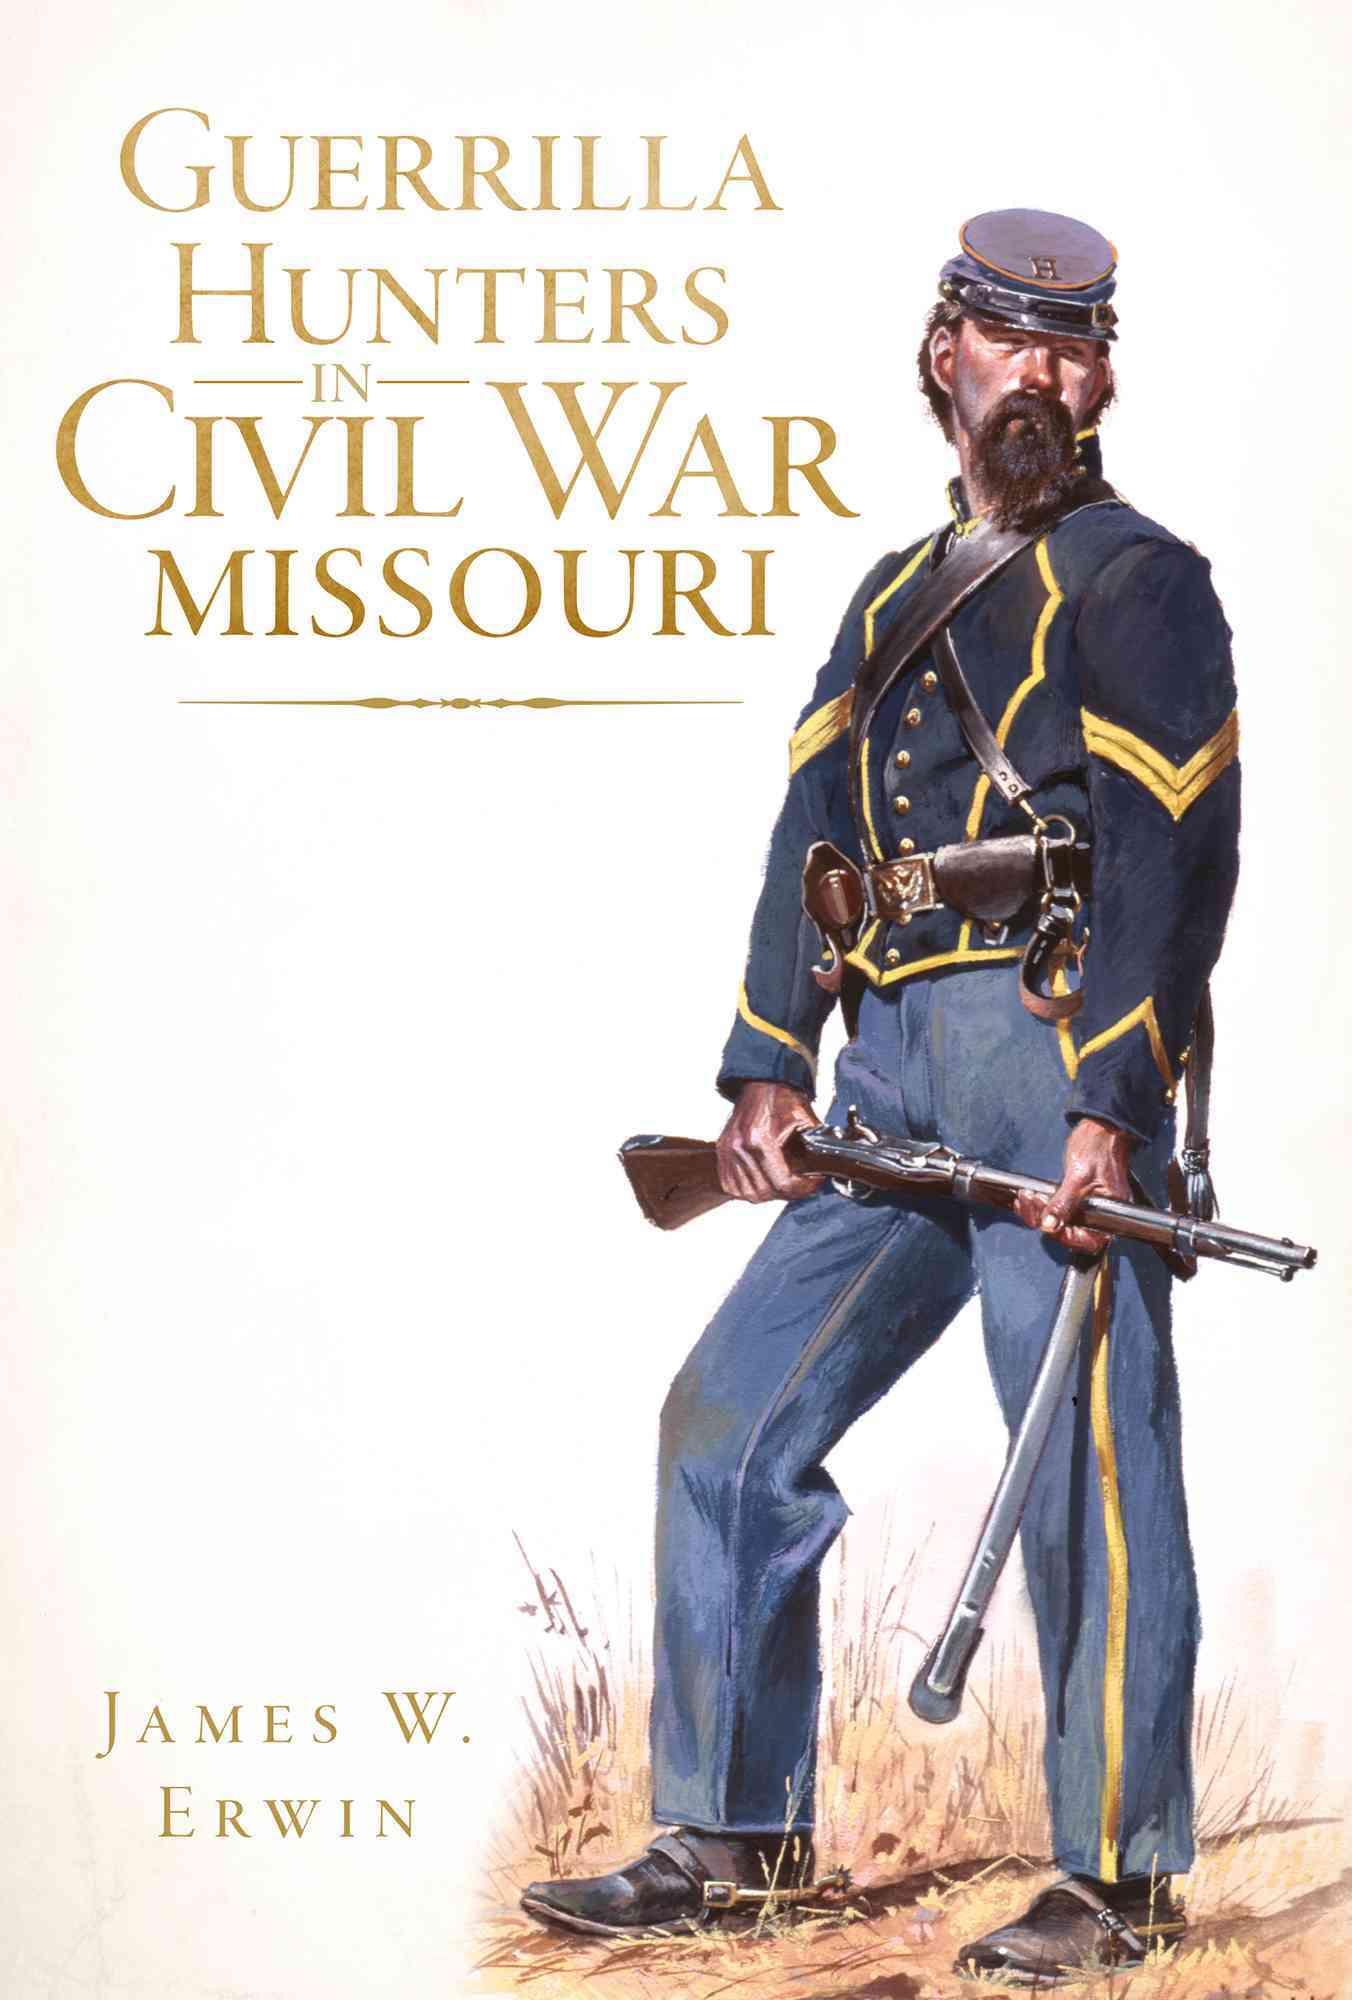 Guerrilla Hunters in Civil War Missouri (Paperback)